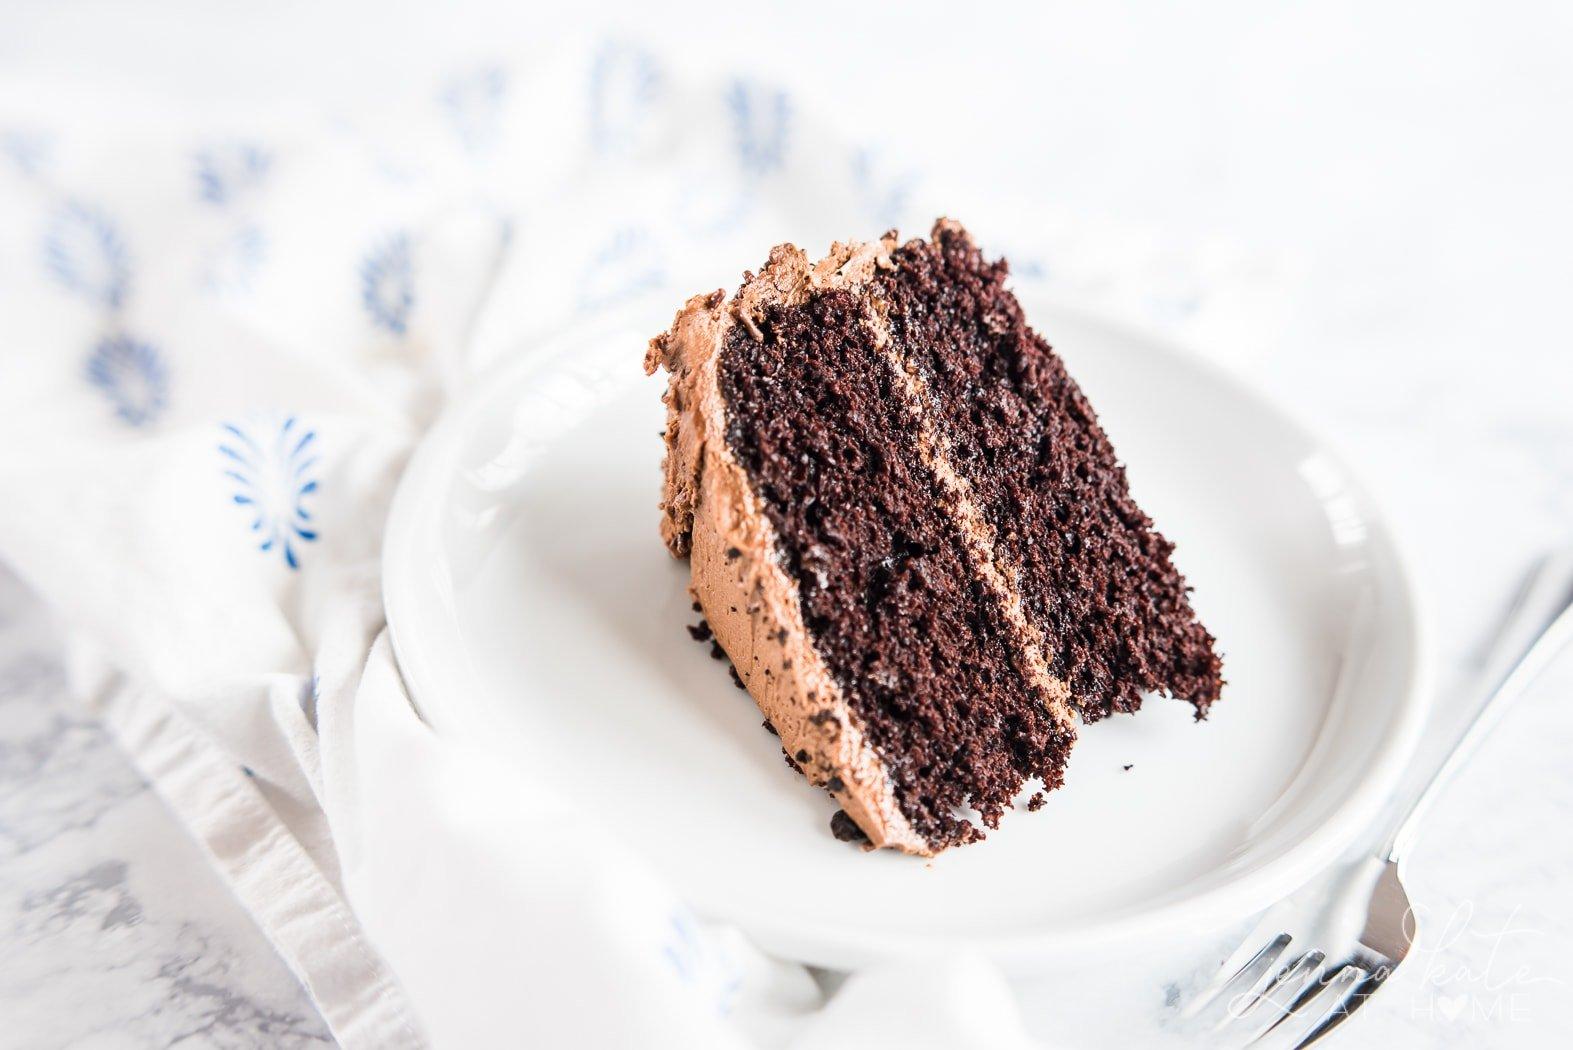 Easy chocolate birthday cake recipe, slice of moist cake on a plate